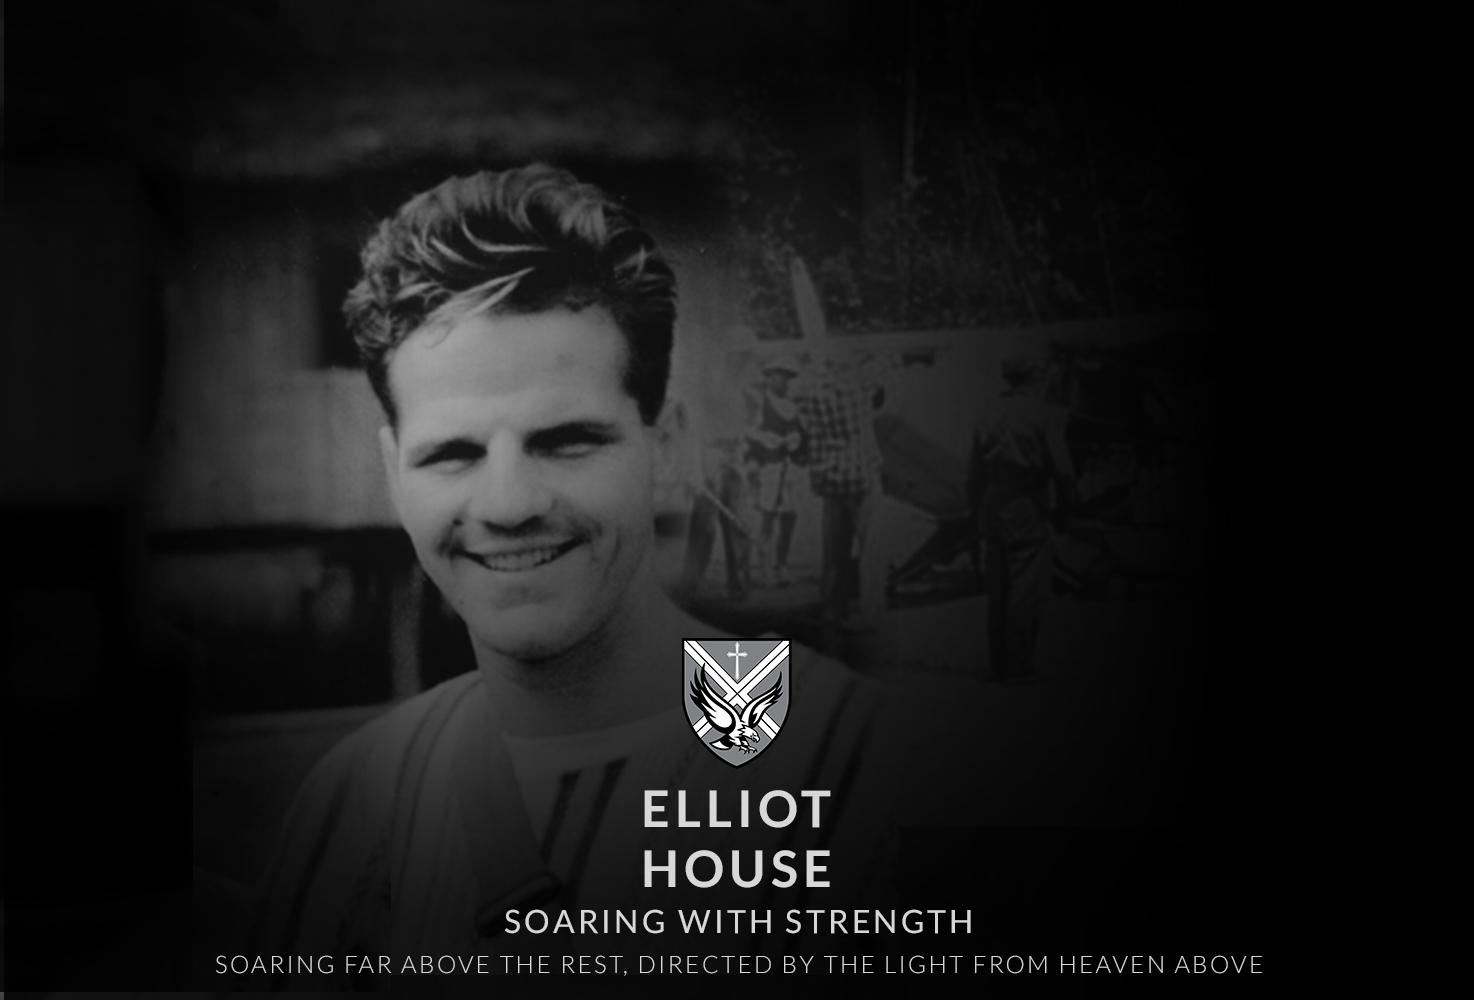 Elliot House Aw2